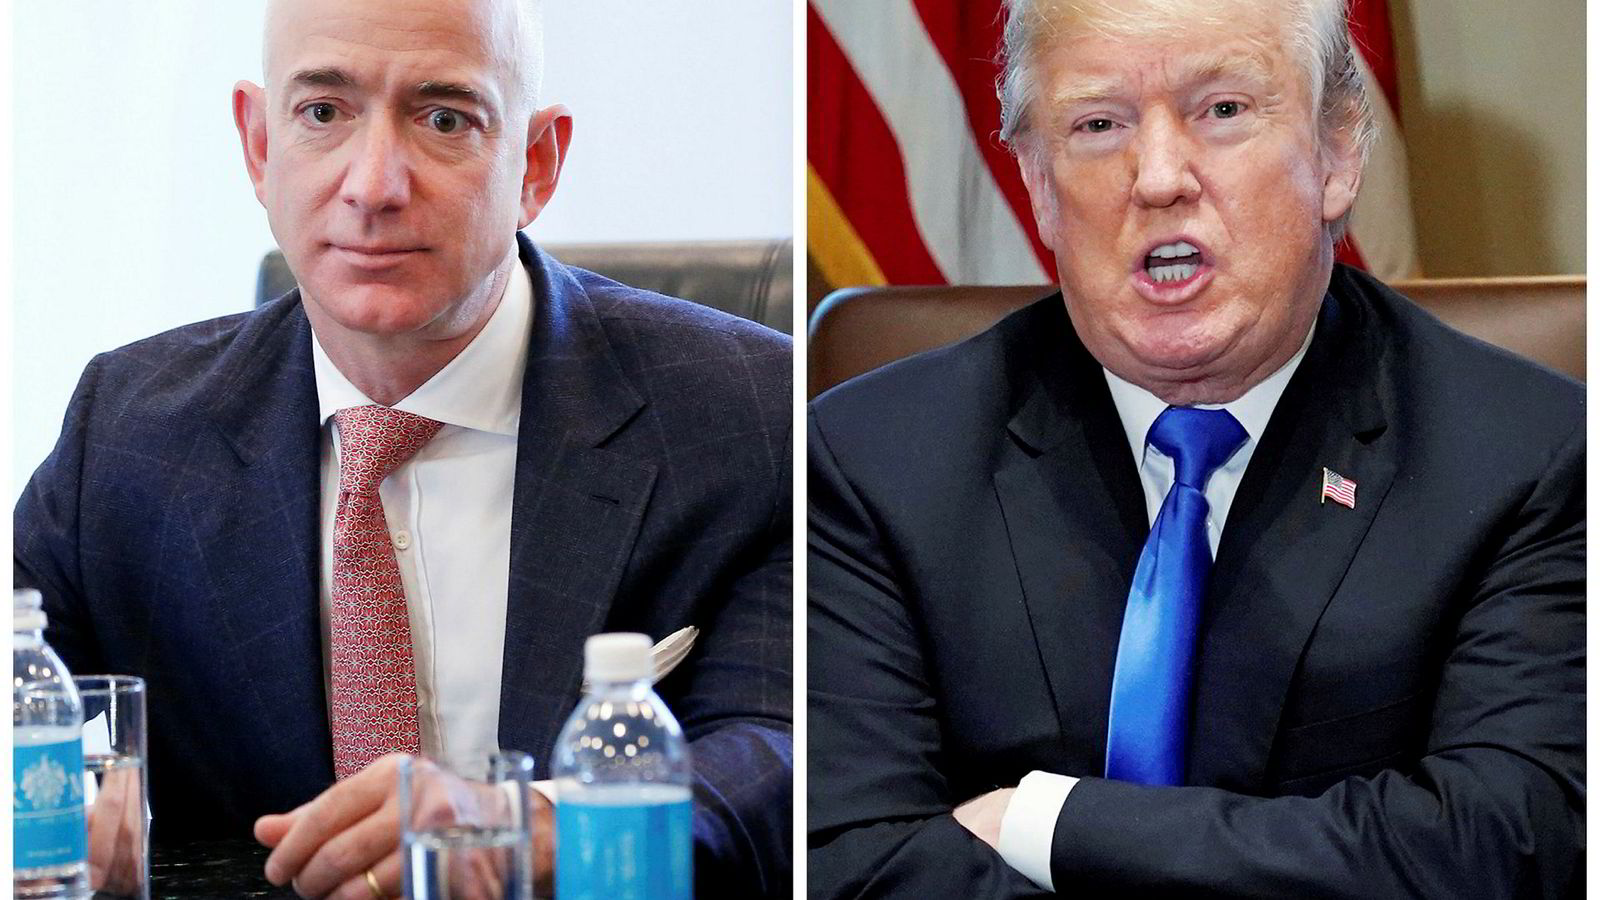 Jeff Bezos (til venstre) kan vinne på at Trump trapper opp handelskrigen med Kina.